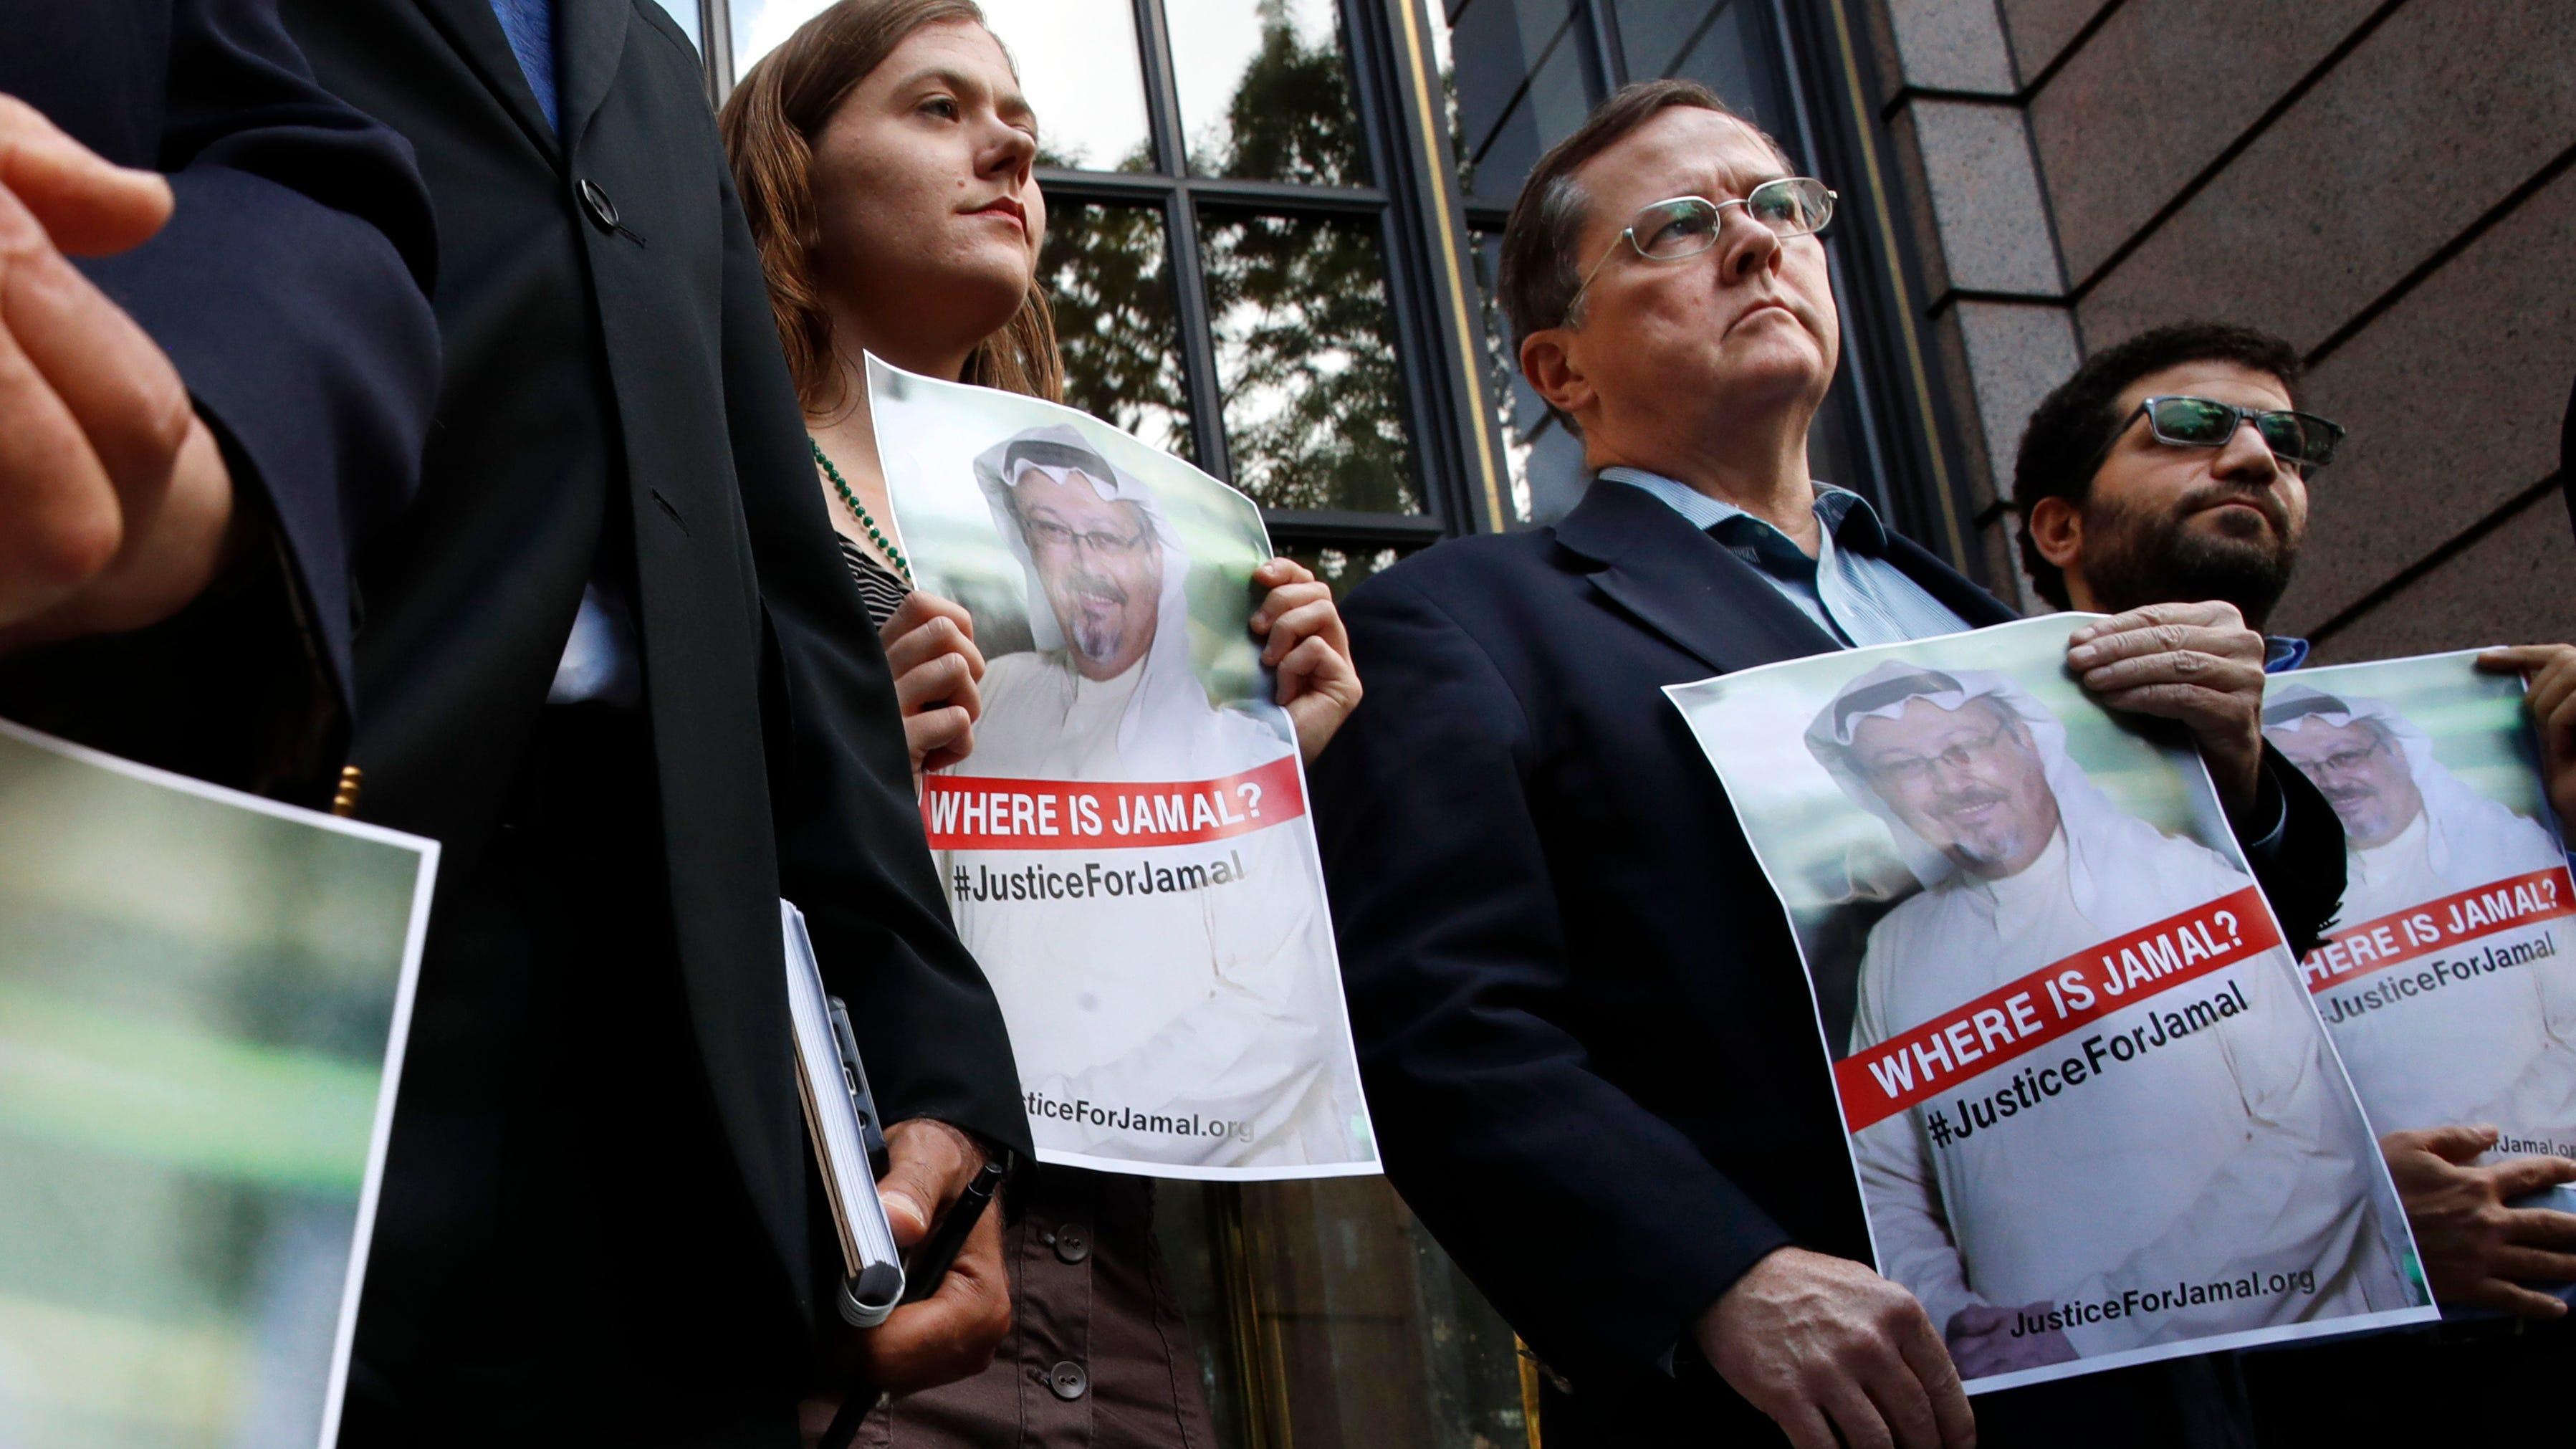 Demonstration for missing columnist Jamal Khashoggi in front of The Washington Post on Oct. 10, 2018.